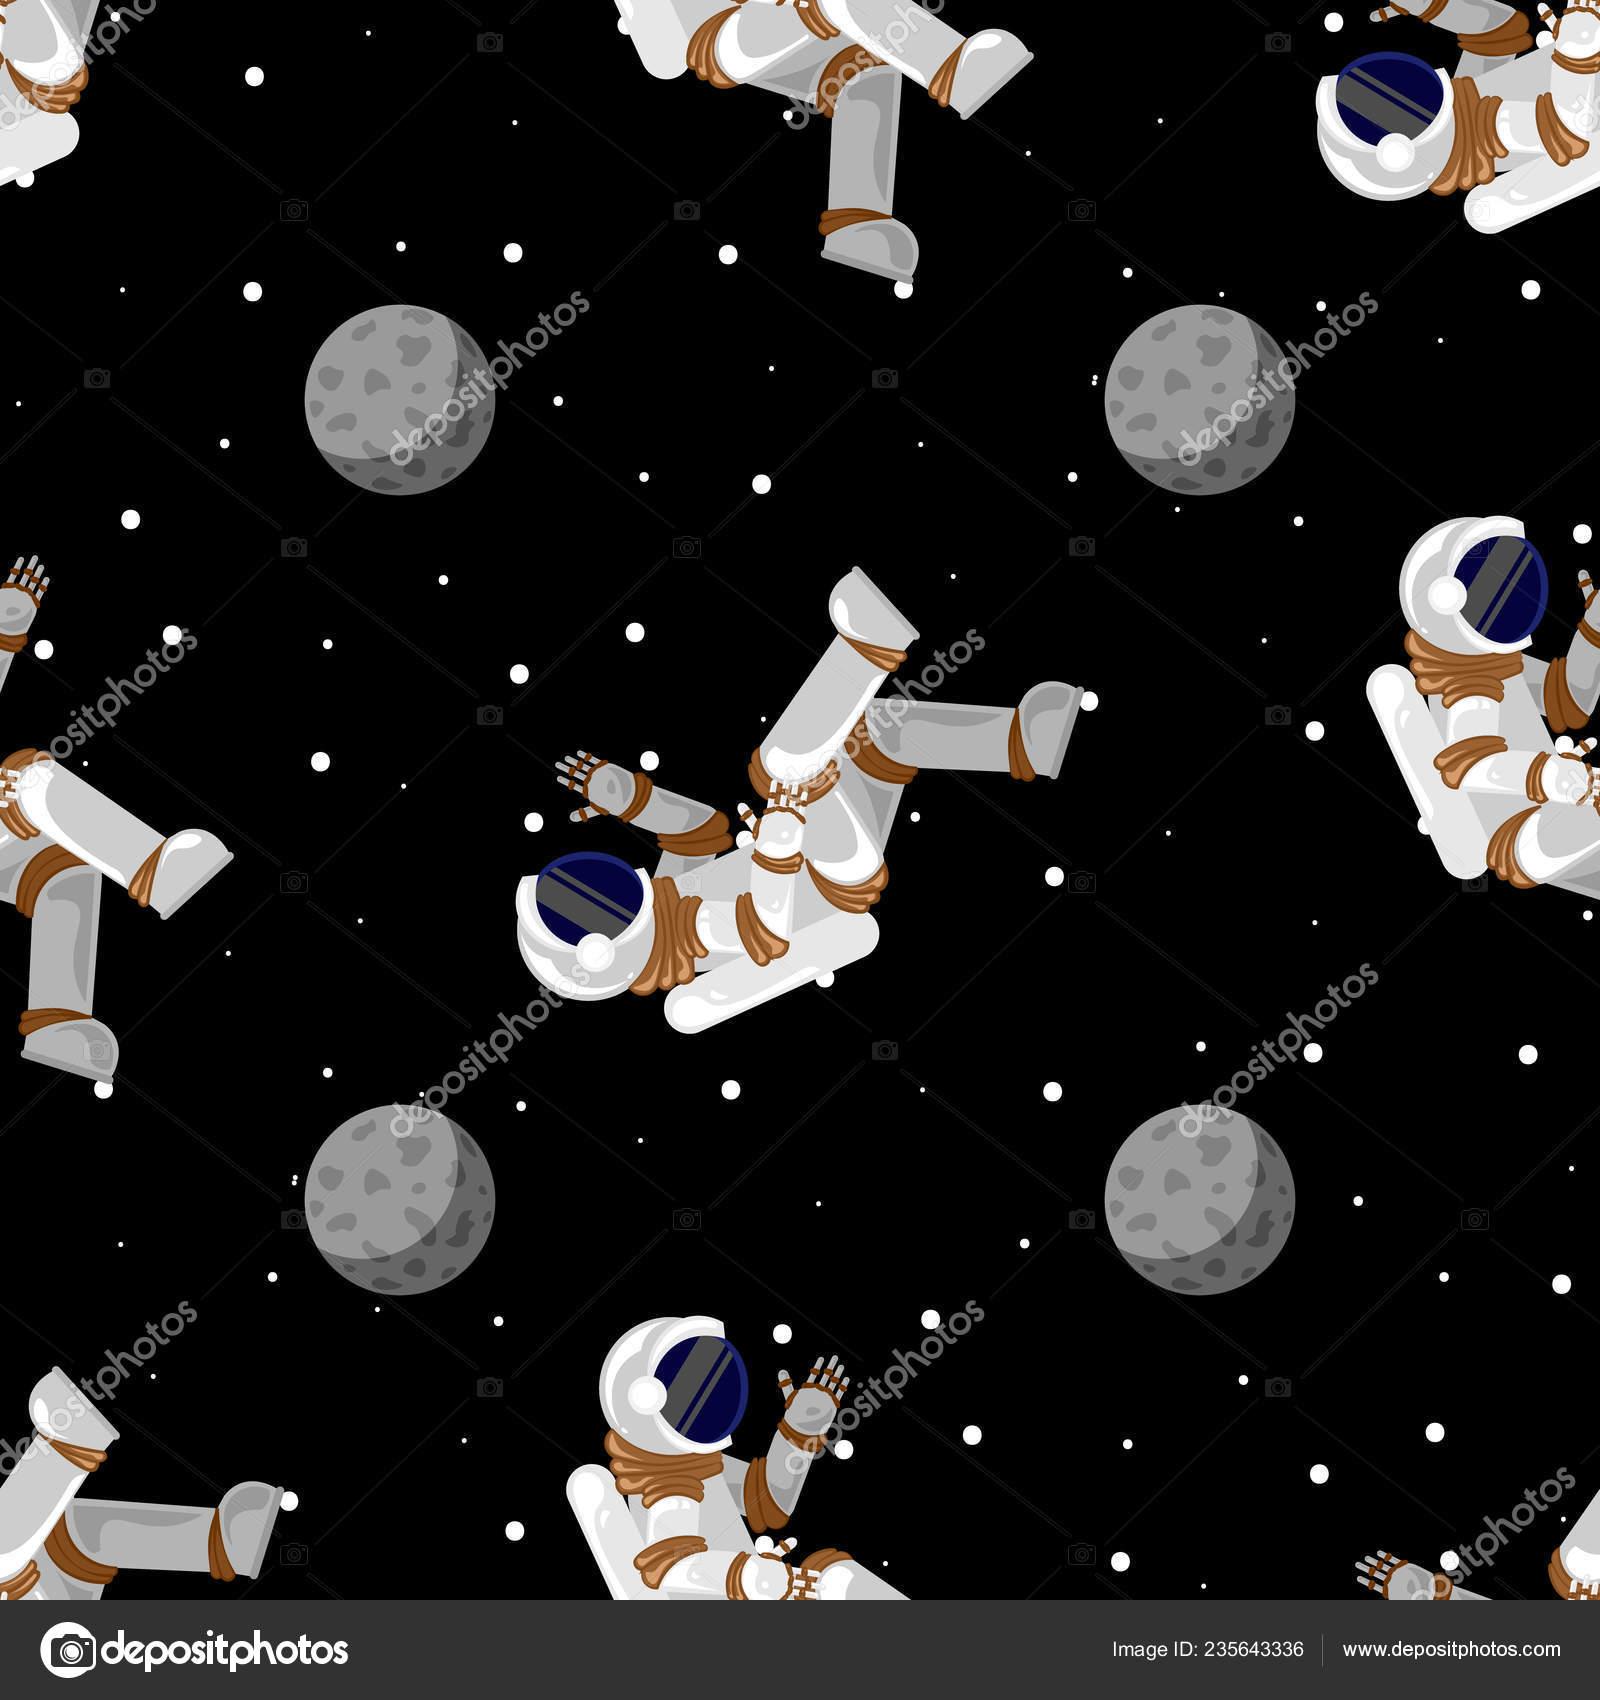 Cartoon Spaceman Wallpaper Cute Funny Cosmonaut Astronaut